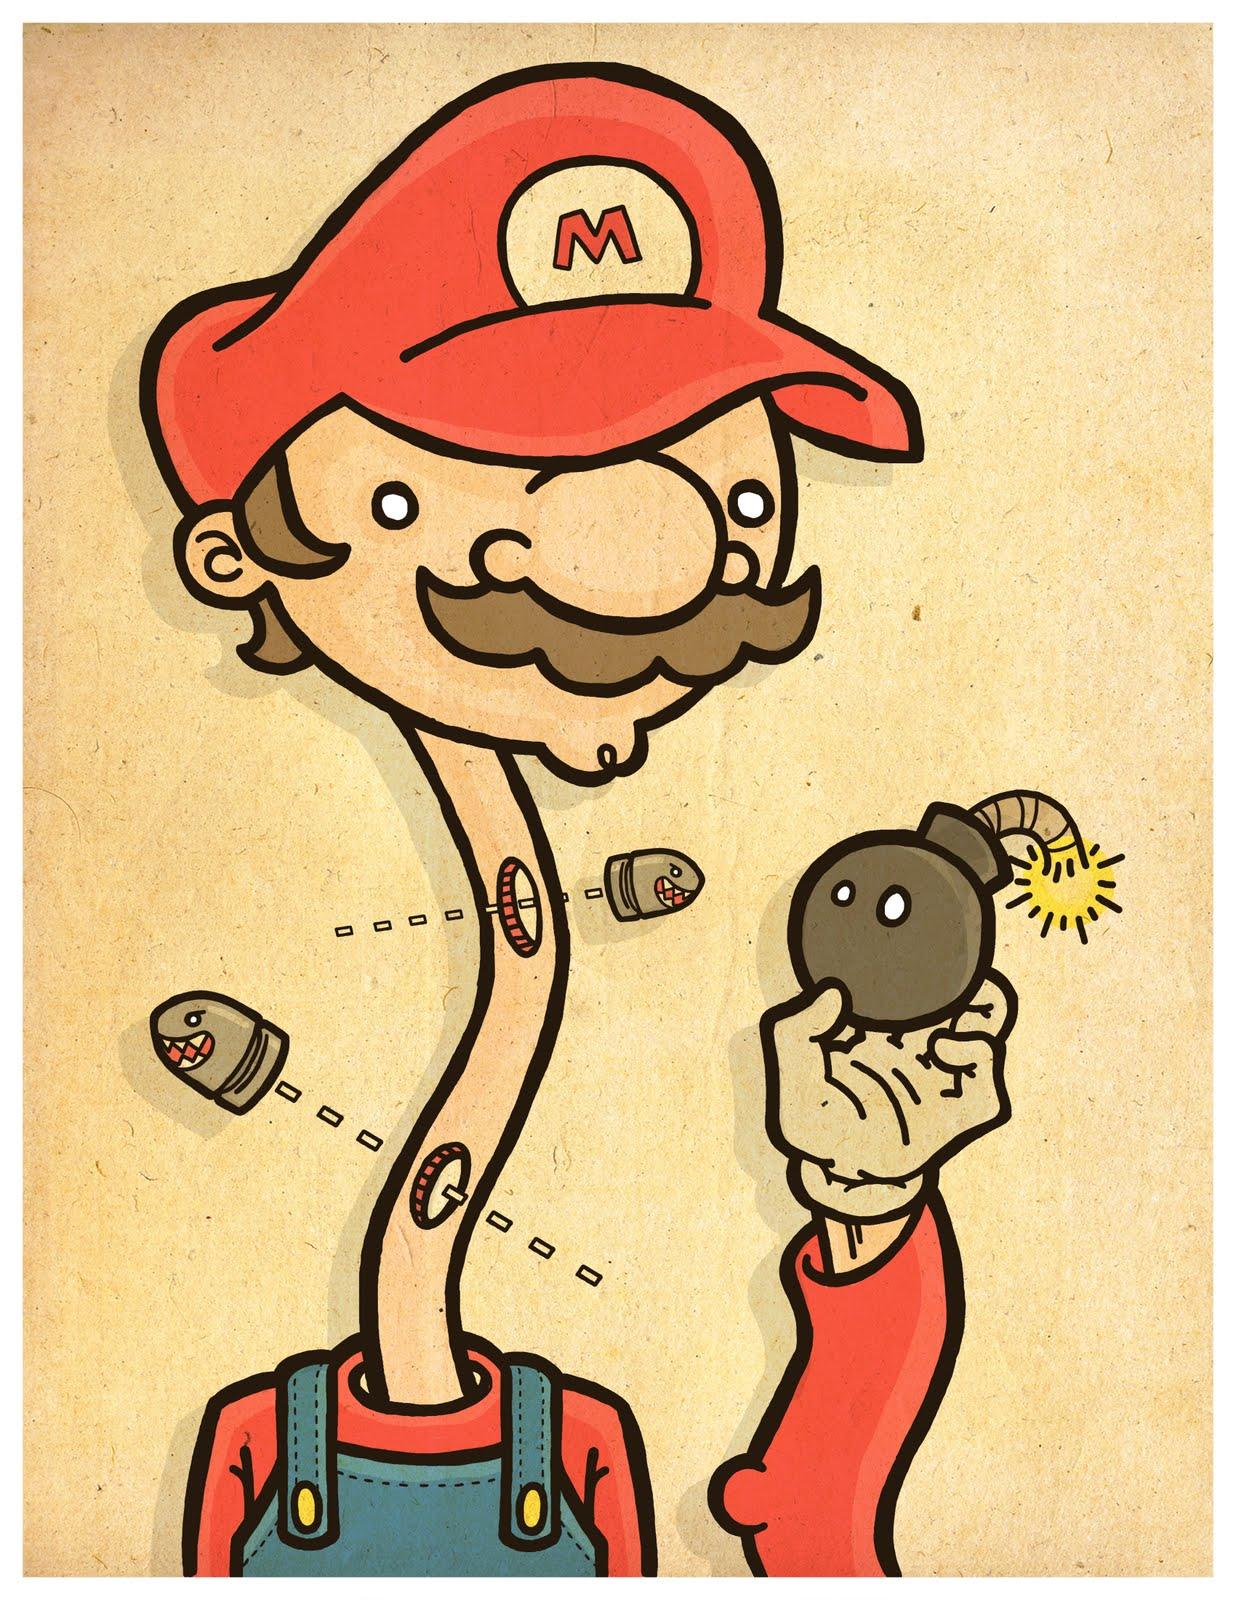 Odd Creations: Super Mario And Link In The Same Predicament